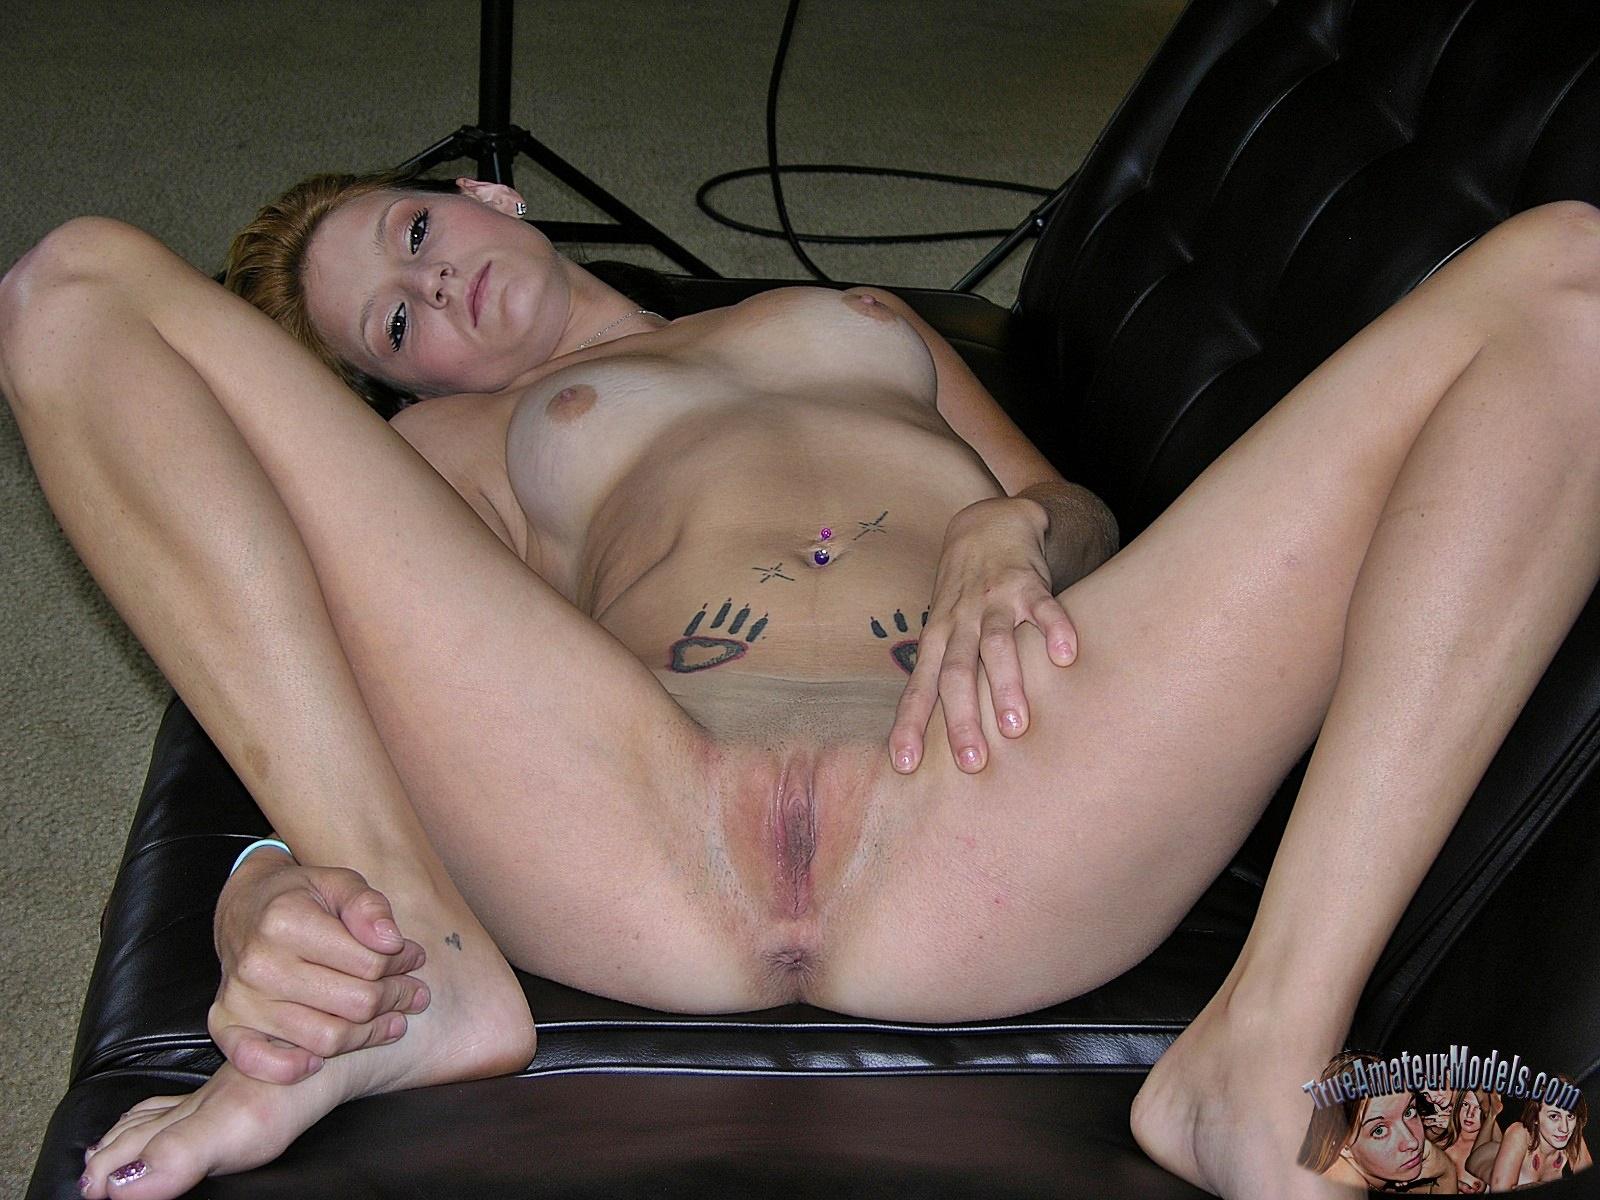 fairly oddparents britney britney naked